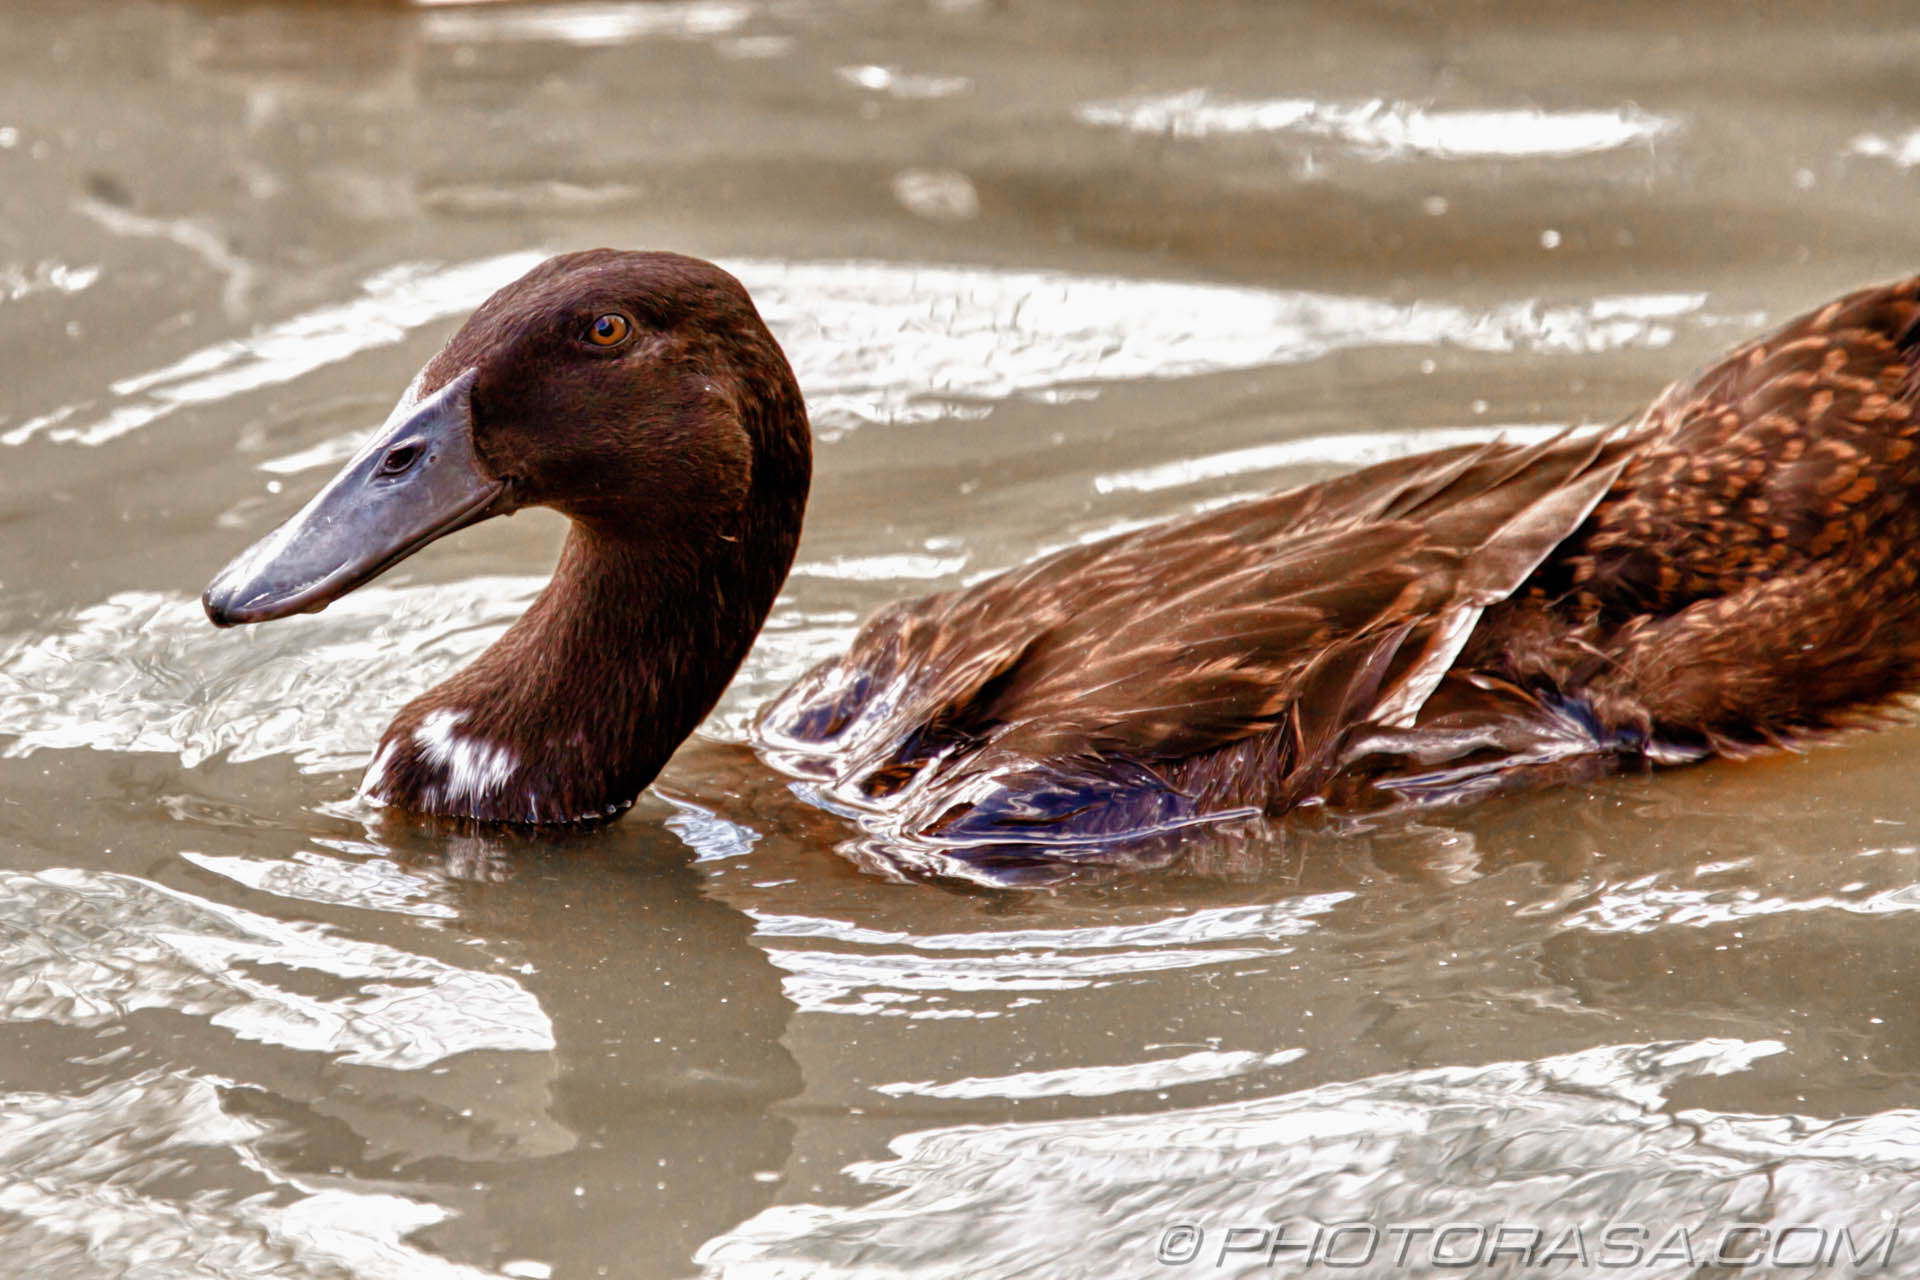 http://photorasa.com/birds-greenworld/dark-brown-campbell-duck/